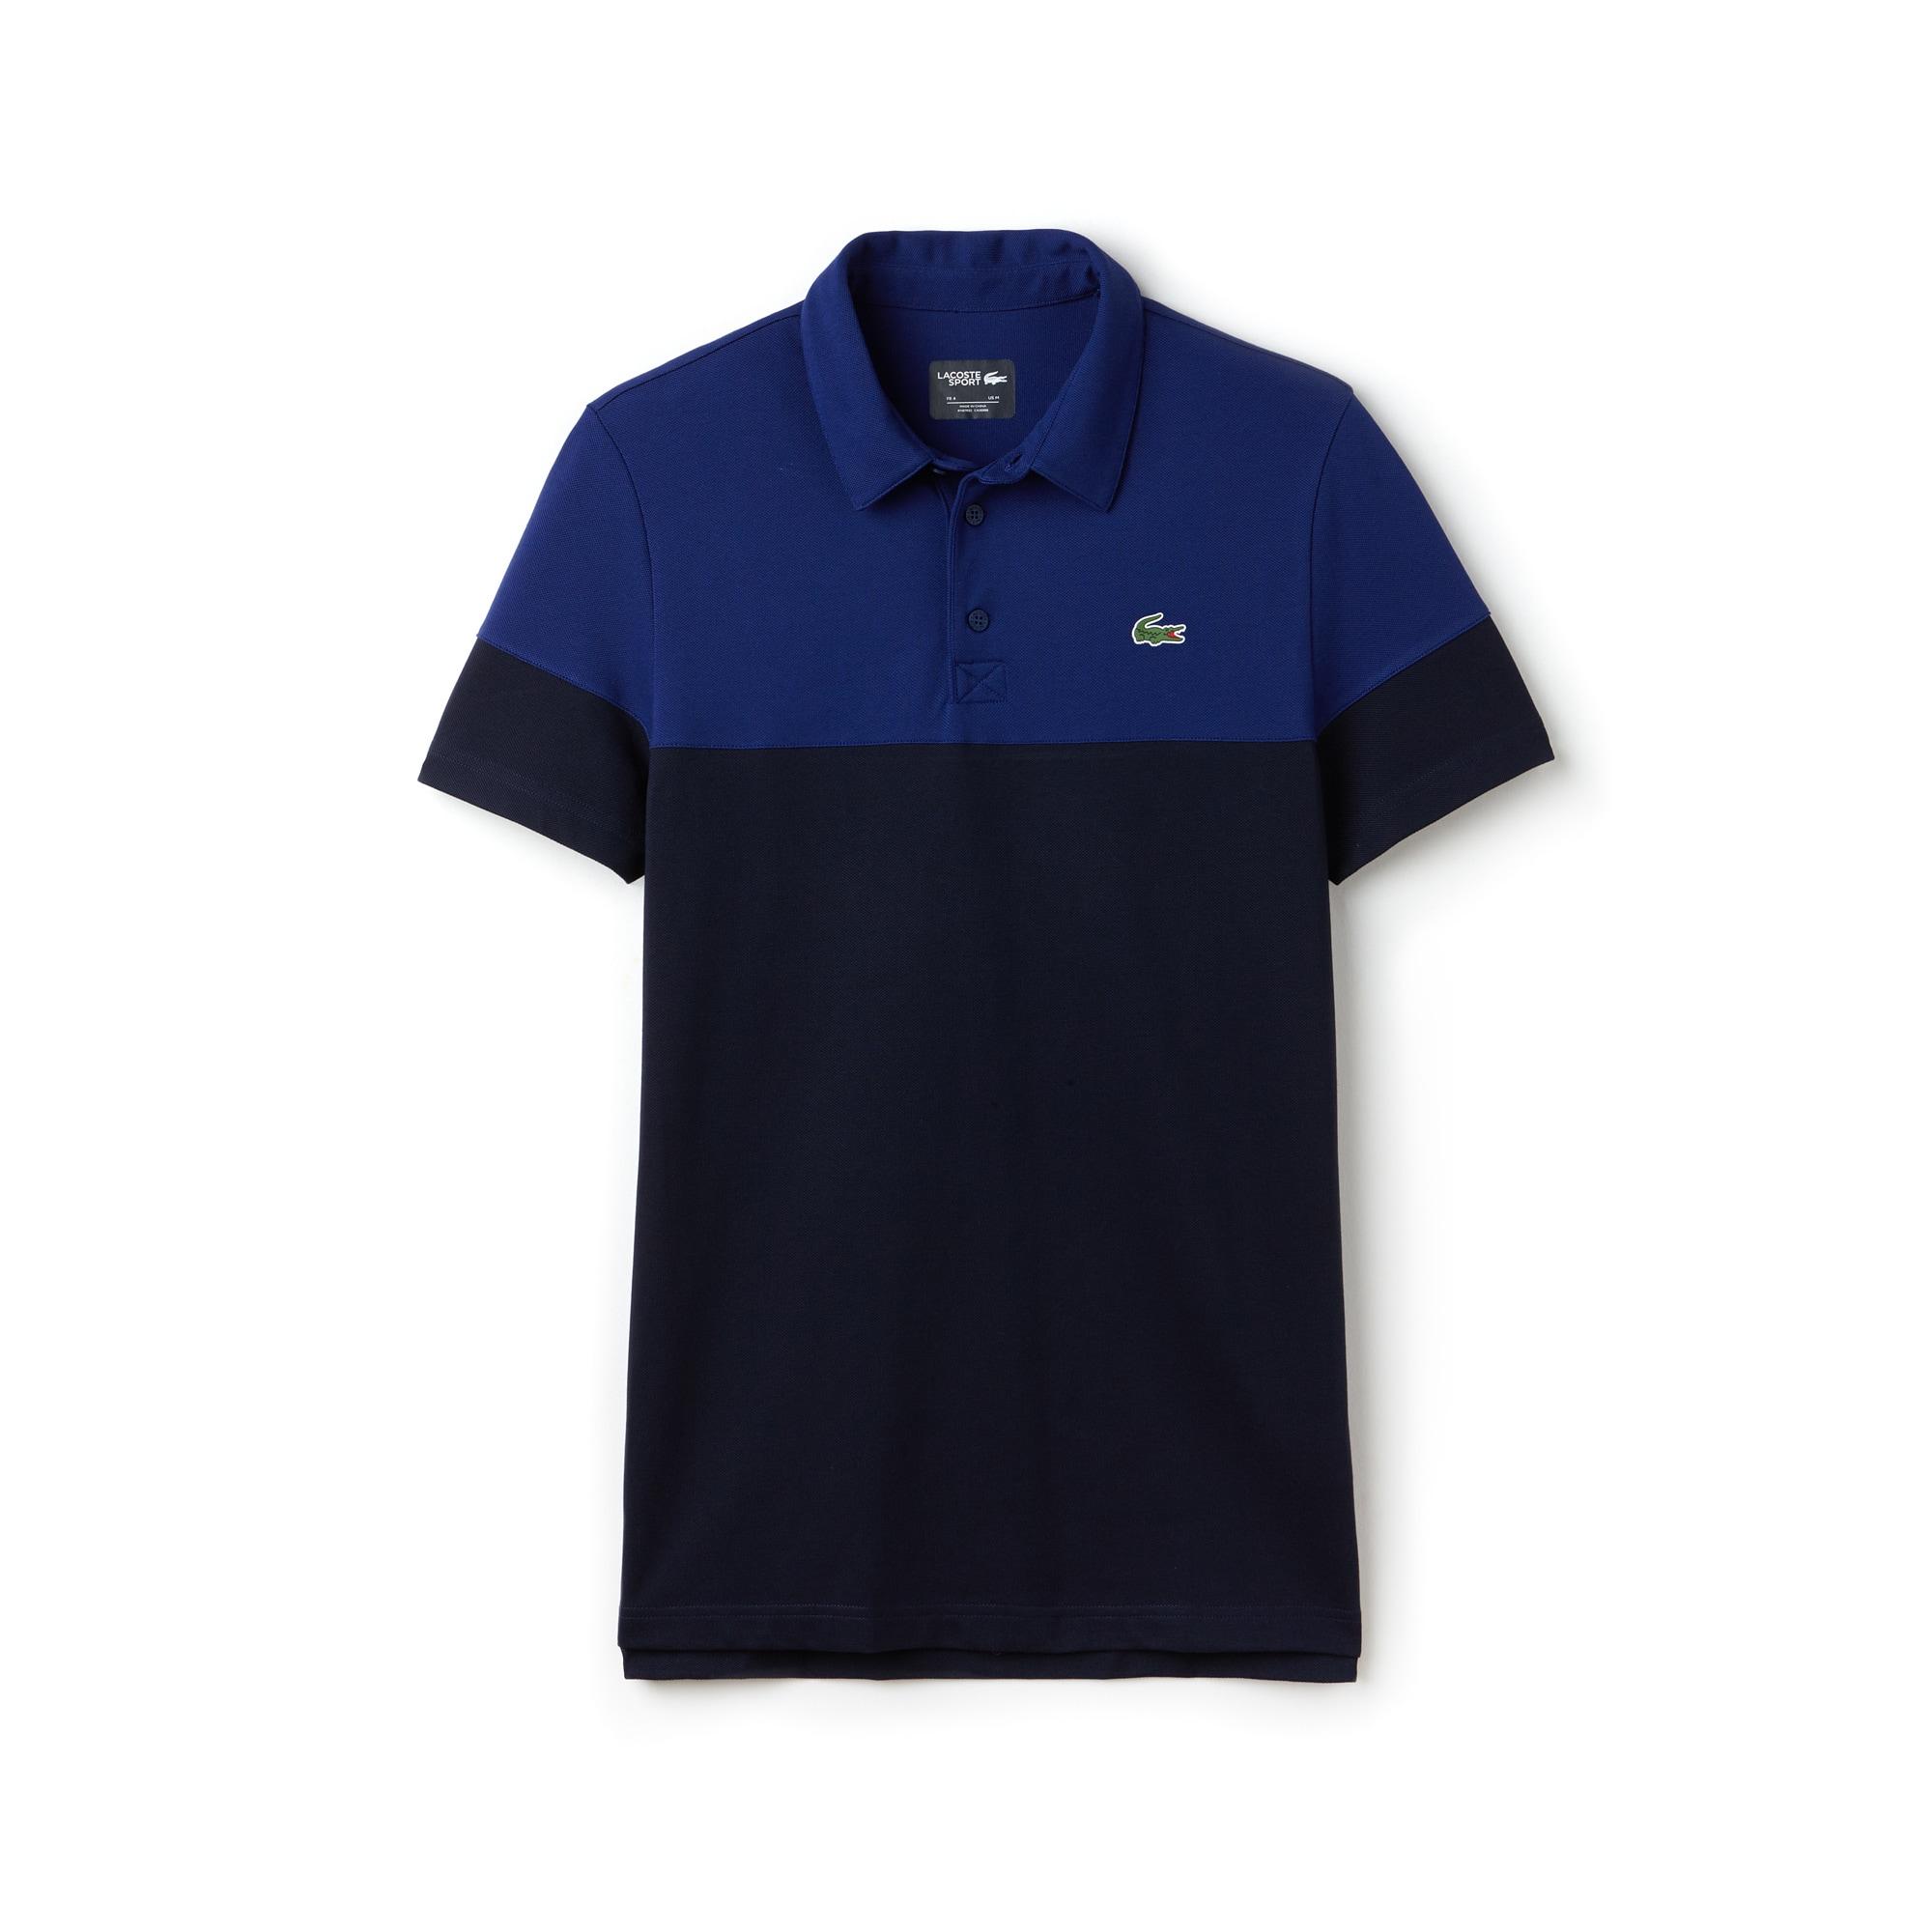 Polo Lacoste SPORT Golf Masculina em Piqué Técnico com Color Block